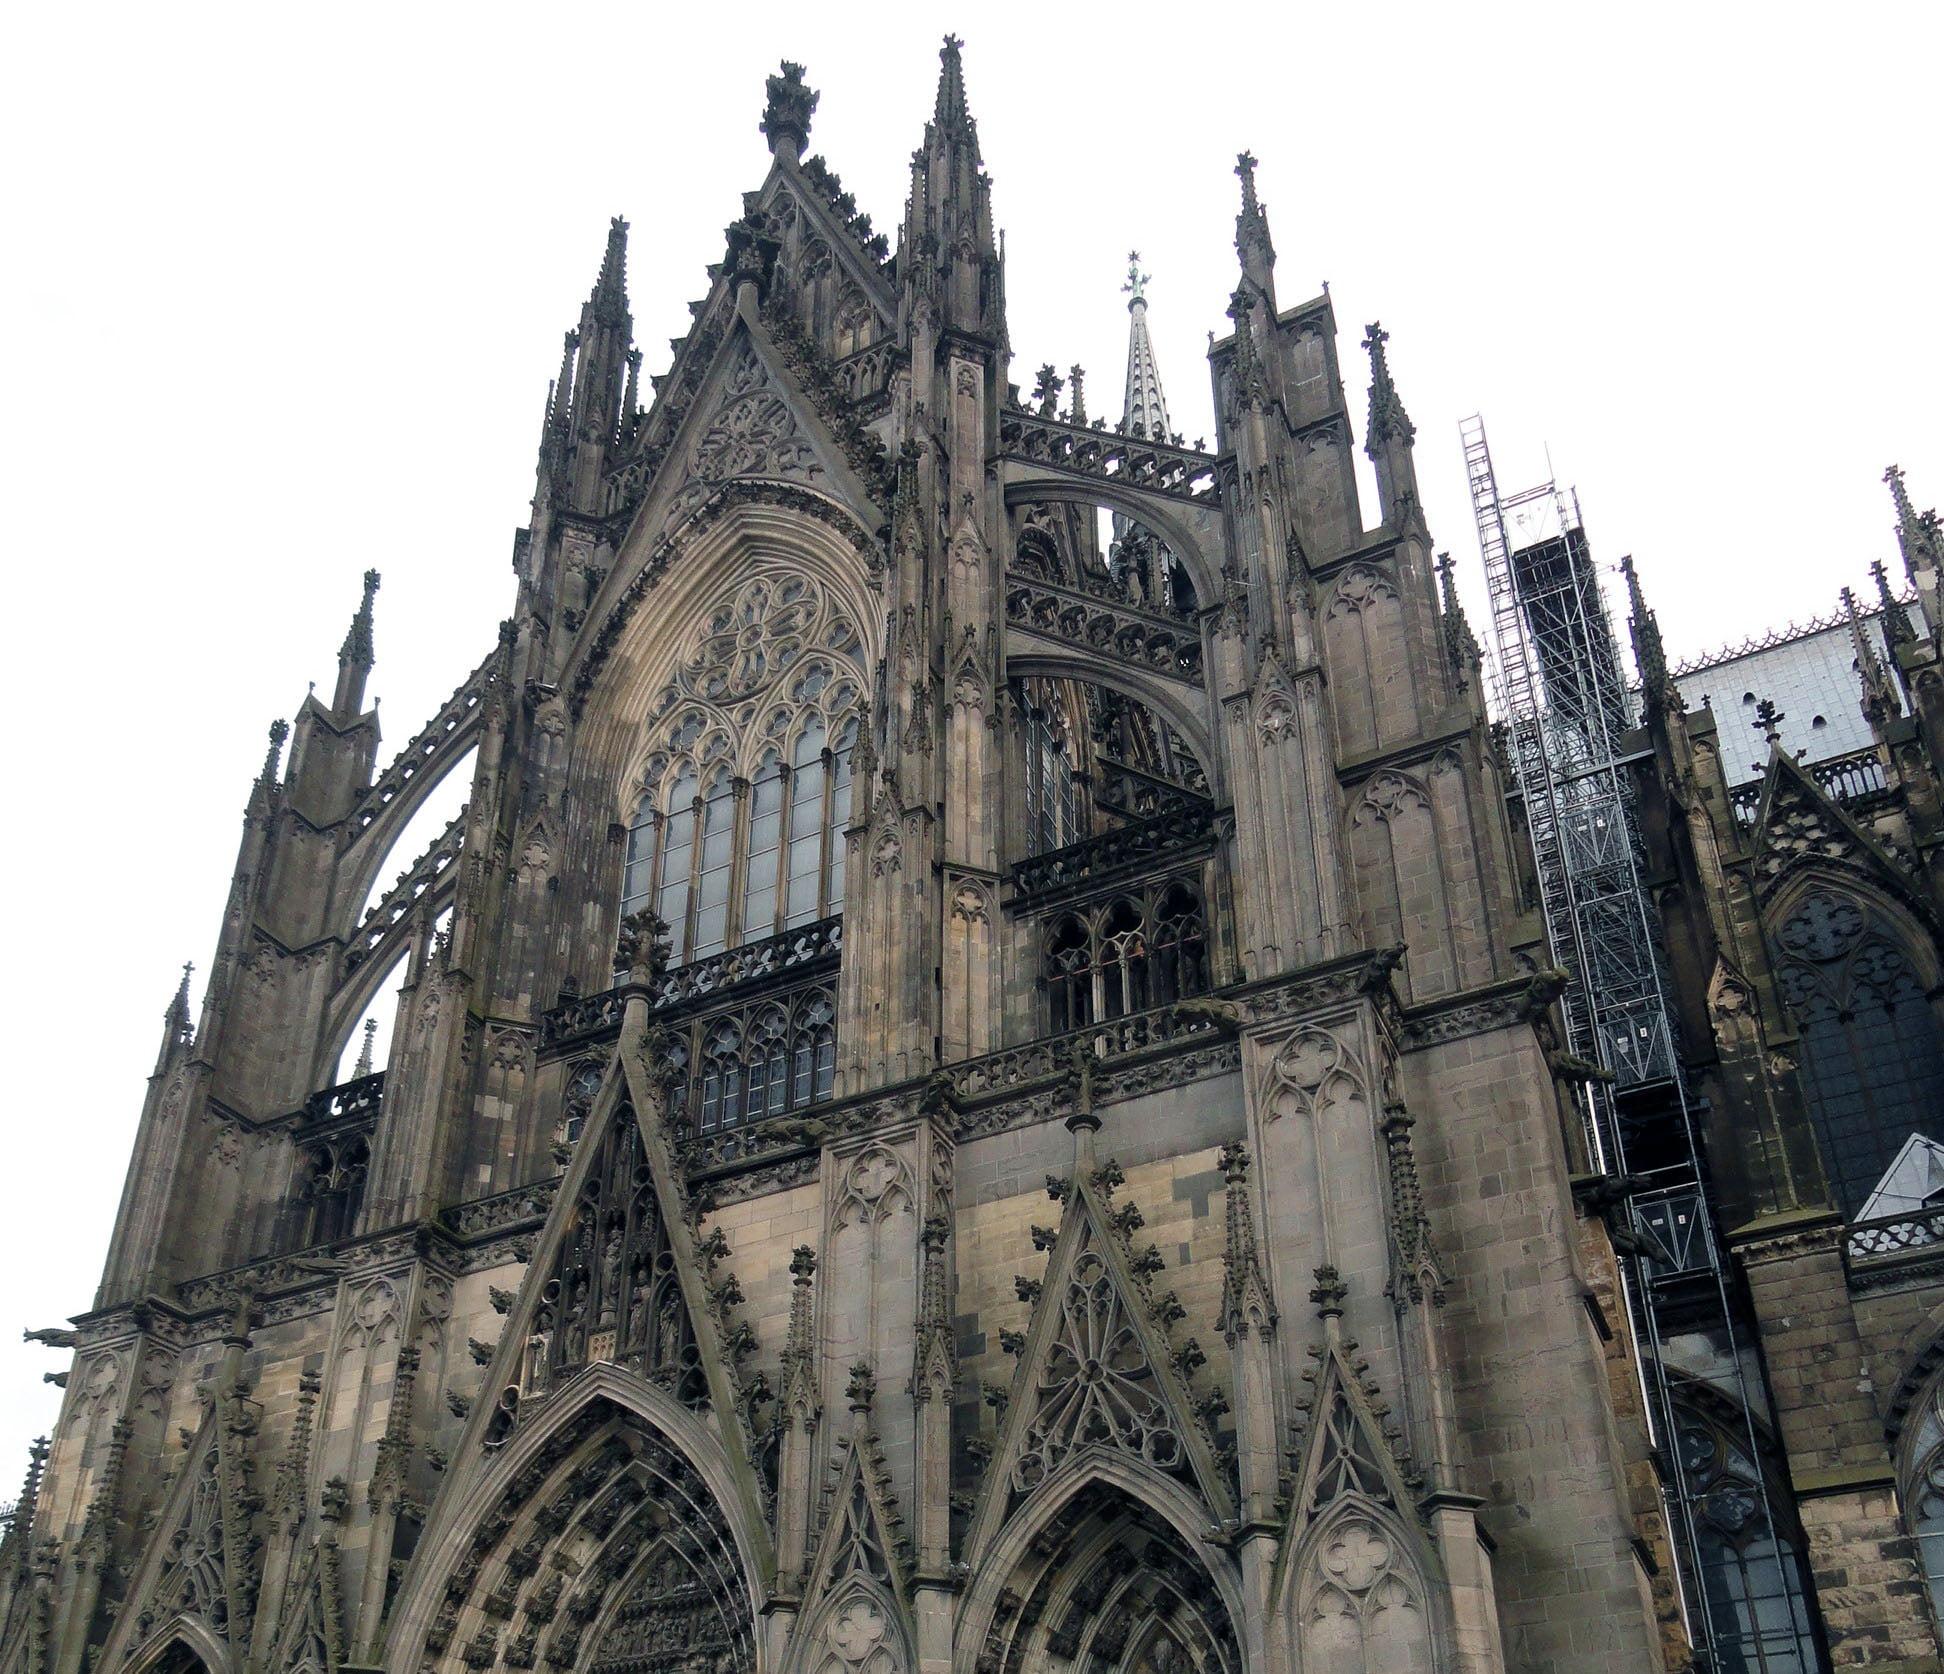 Nemacka_Keln_goticka_katedrala_evropski_gradovi_autobusom_first_minute